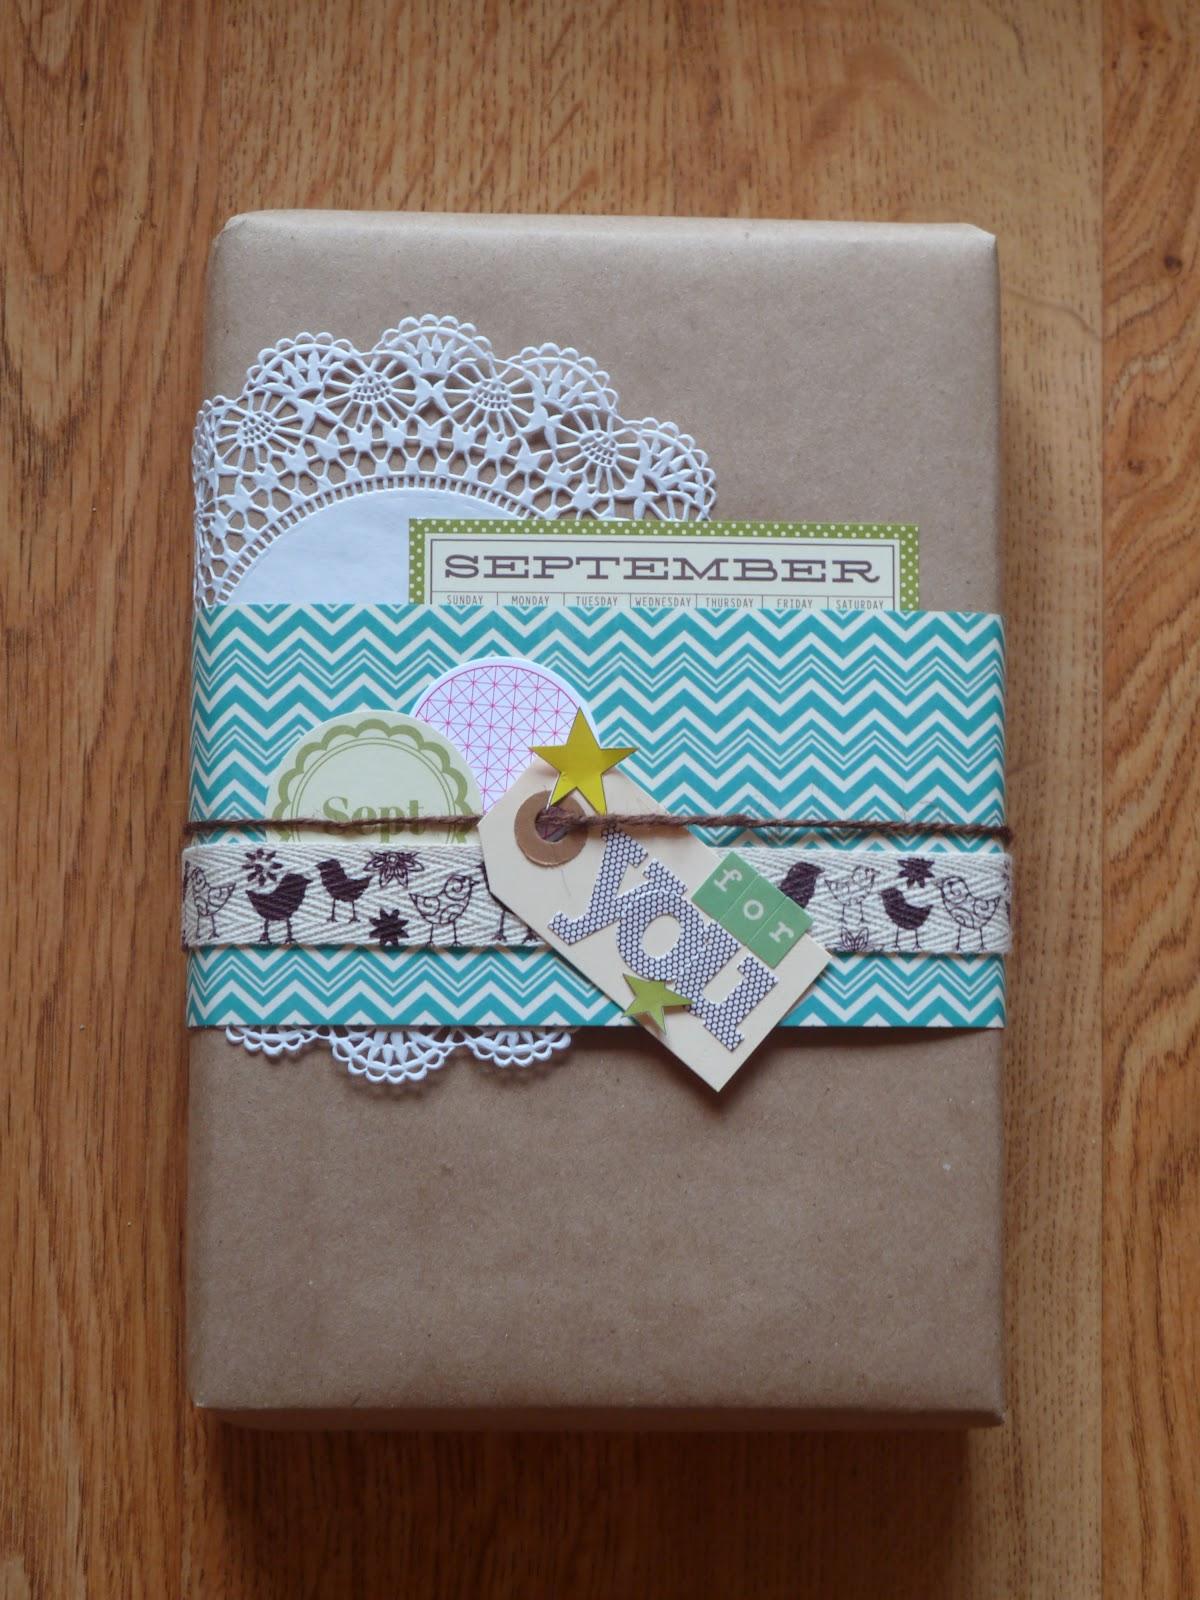 Krafty Kat Giftwrap Goodness Creative Gift Wrap